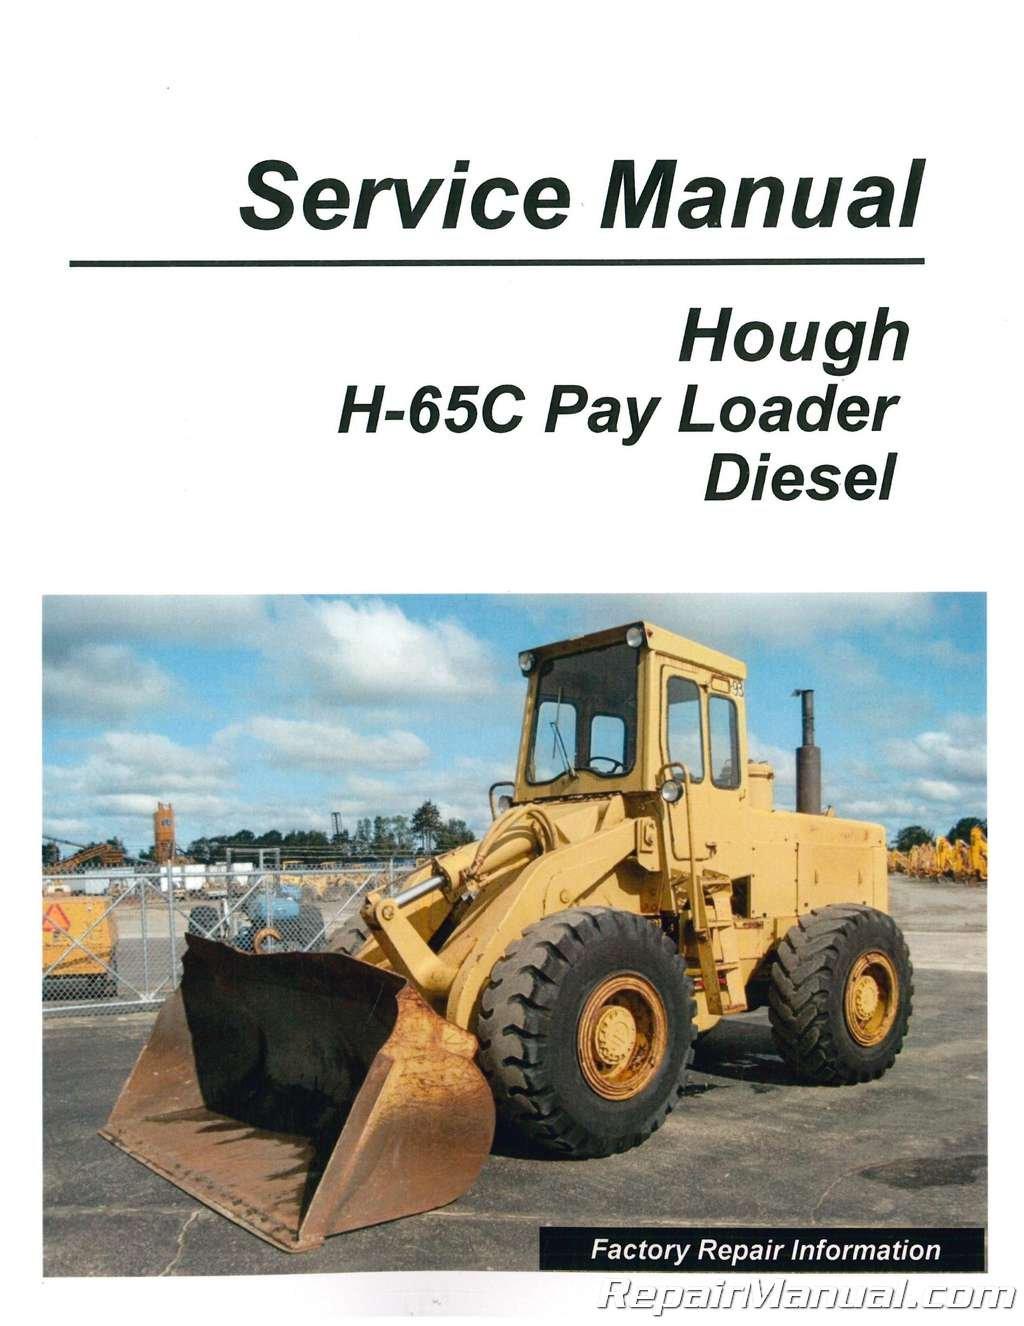 JS-HO-S-H-65C HOUGH H-65C Pay Loader Diesel Service Manual: Manufacturer:  Amazon.com: Books